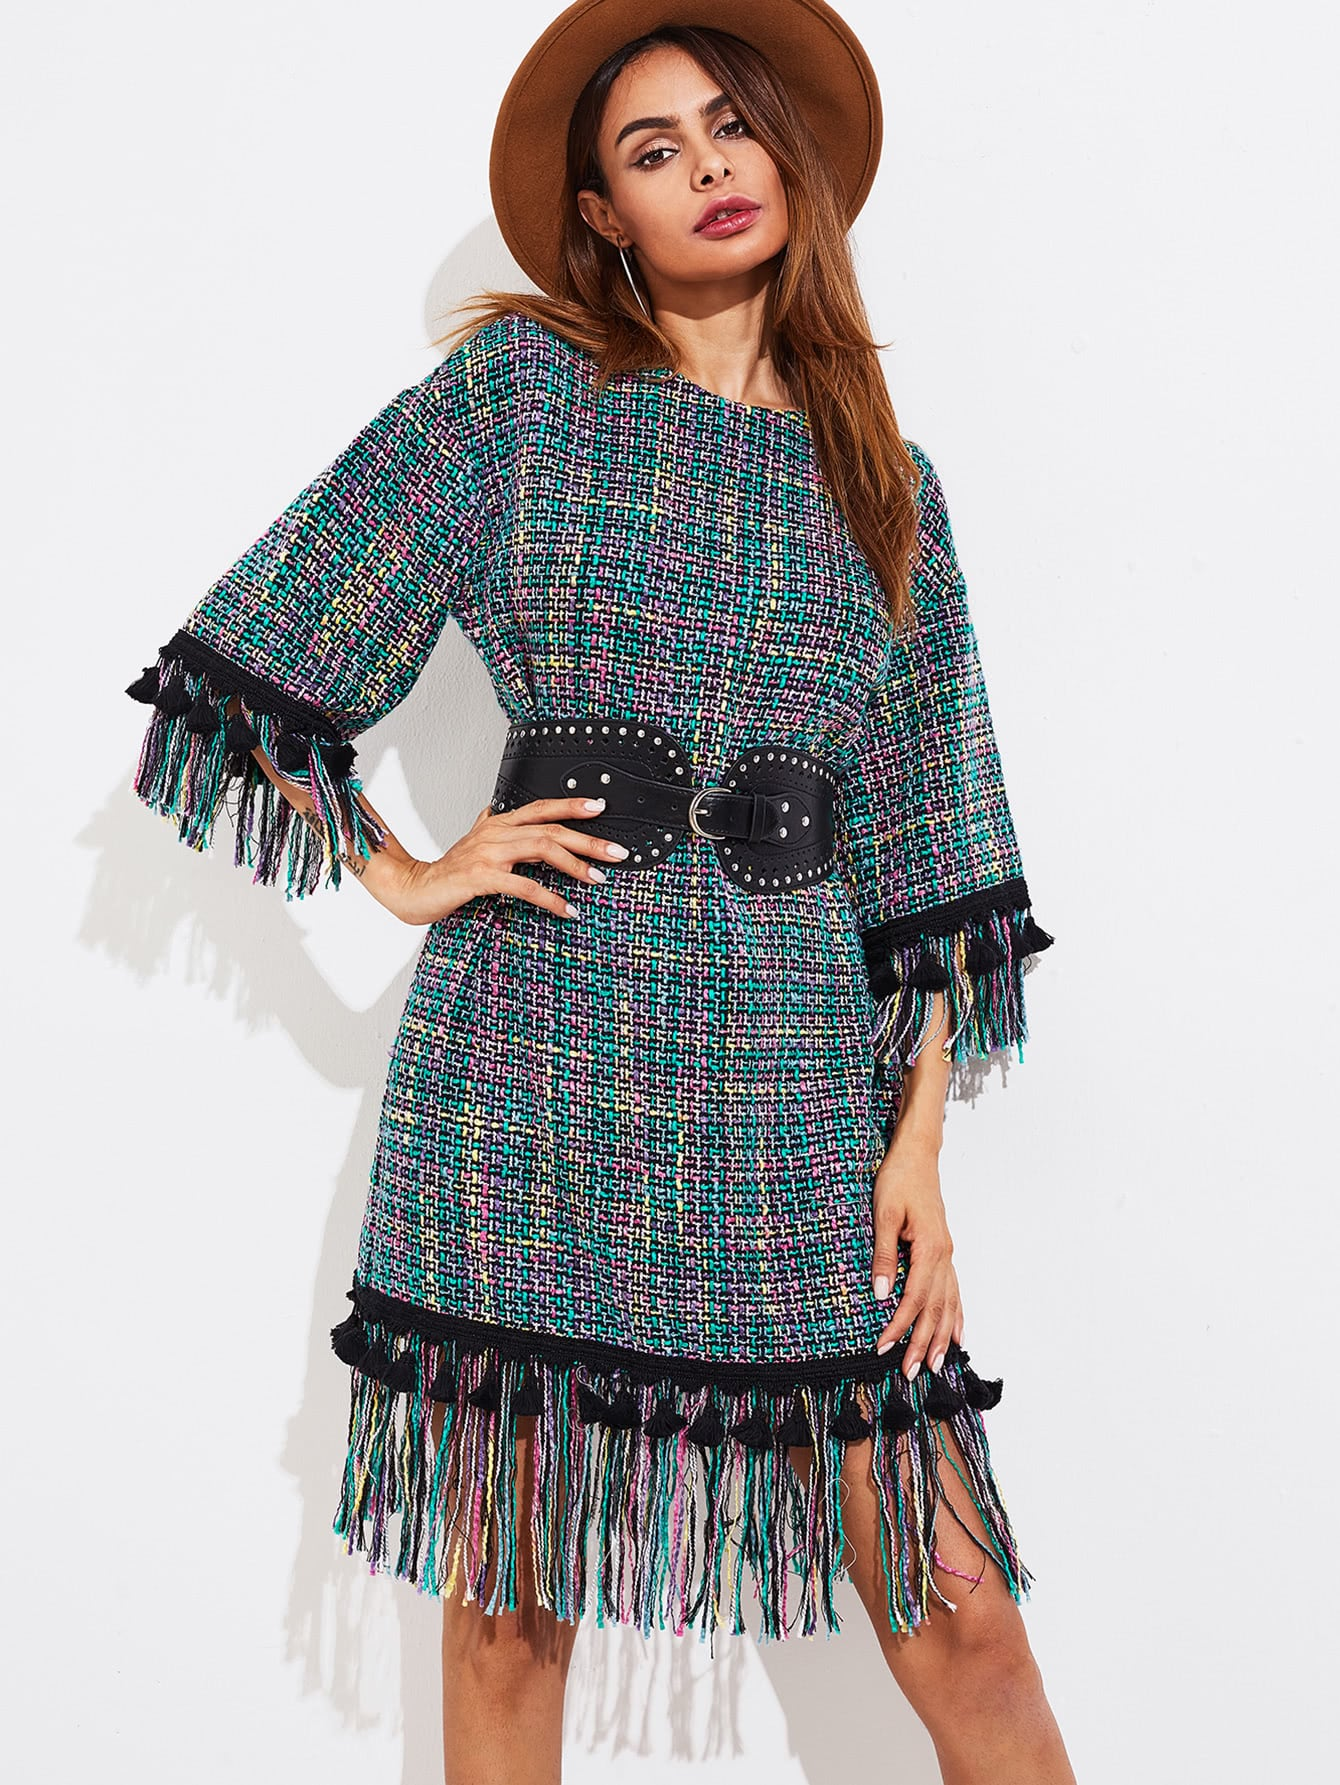 Fringe And Tassel Trim Tweed Dress dress170711705